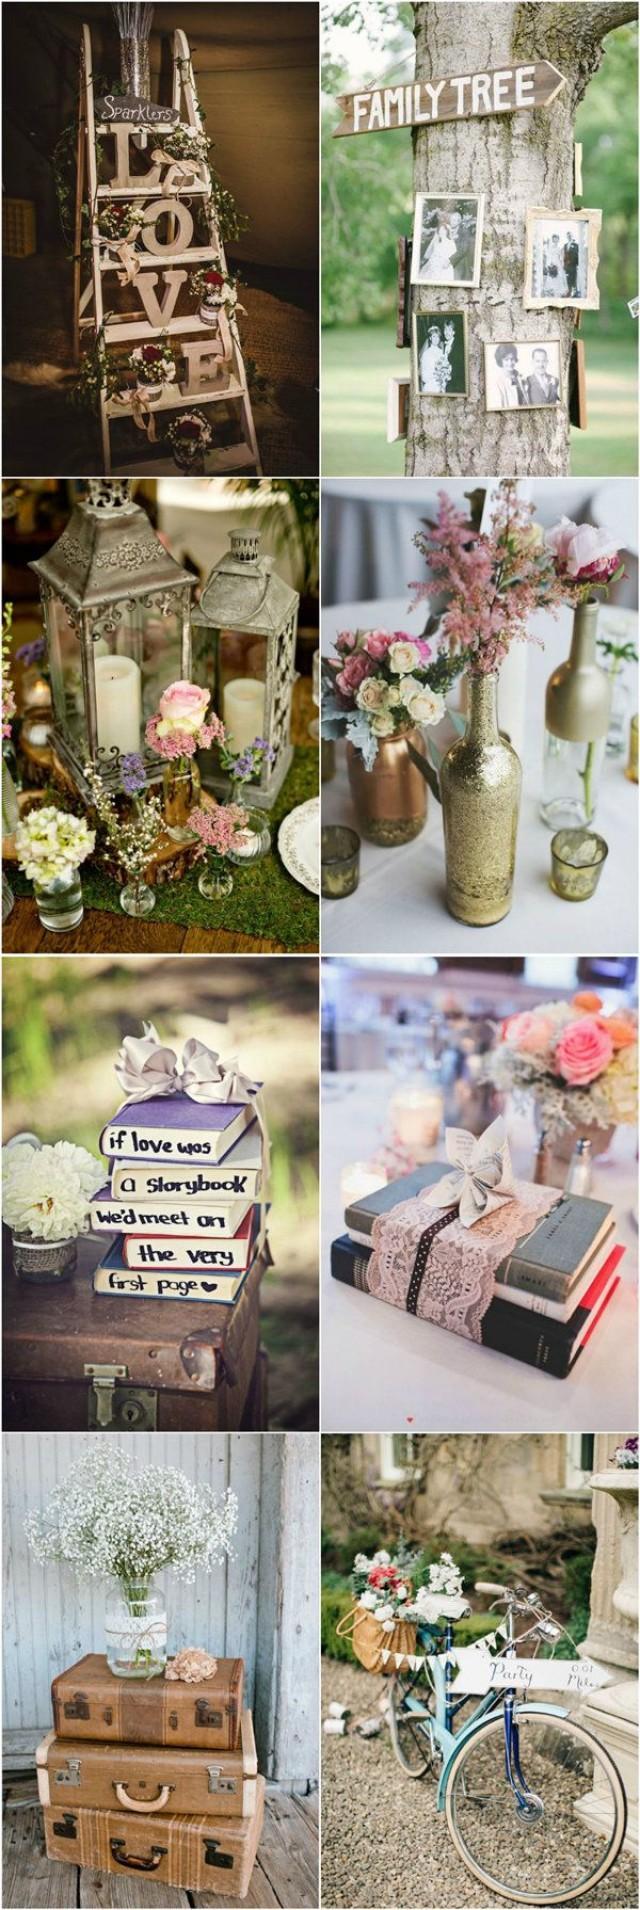 30 Stunning Vintage Wedding Ideas For Spring Summer 2576503